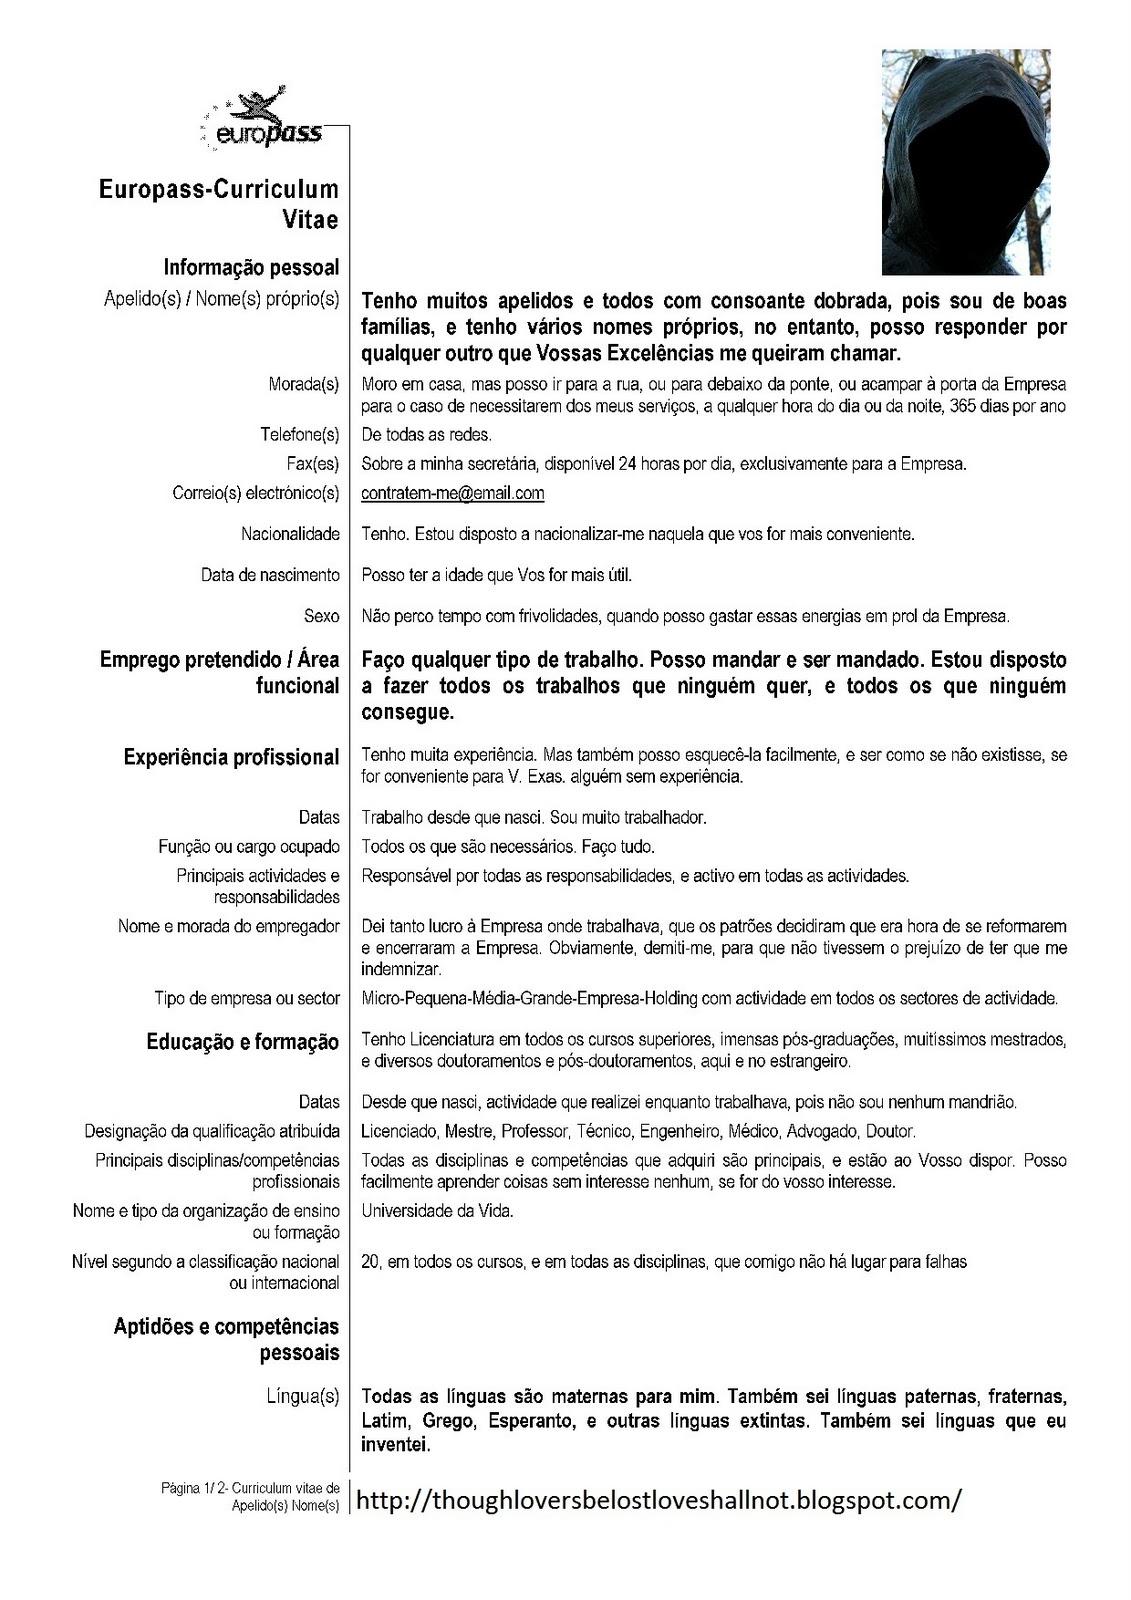 cv format international standards professional resume cover cv format international standards latest cv format 2017 in in ms word writing cv